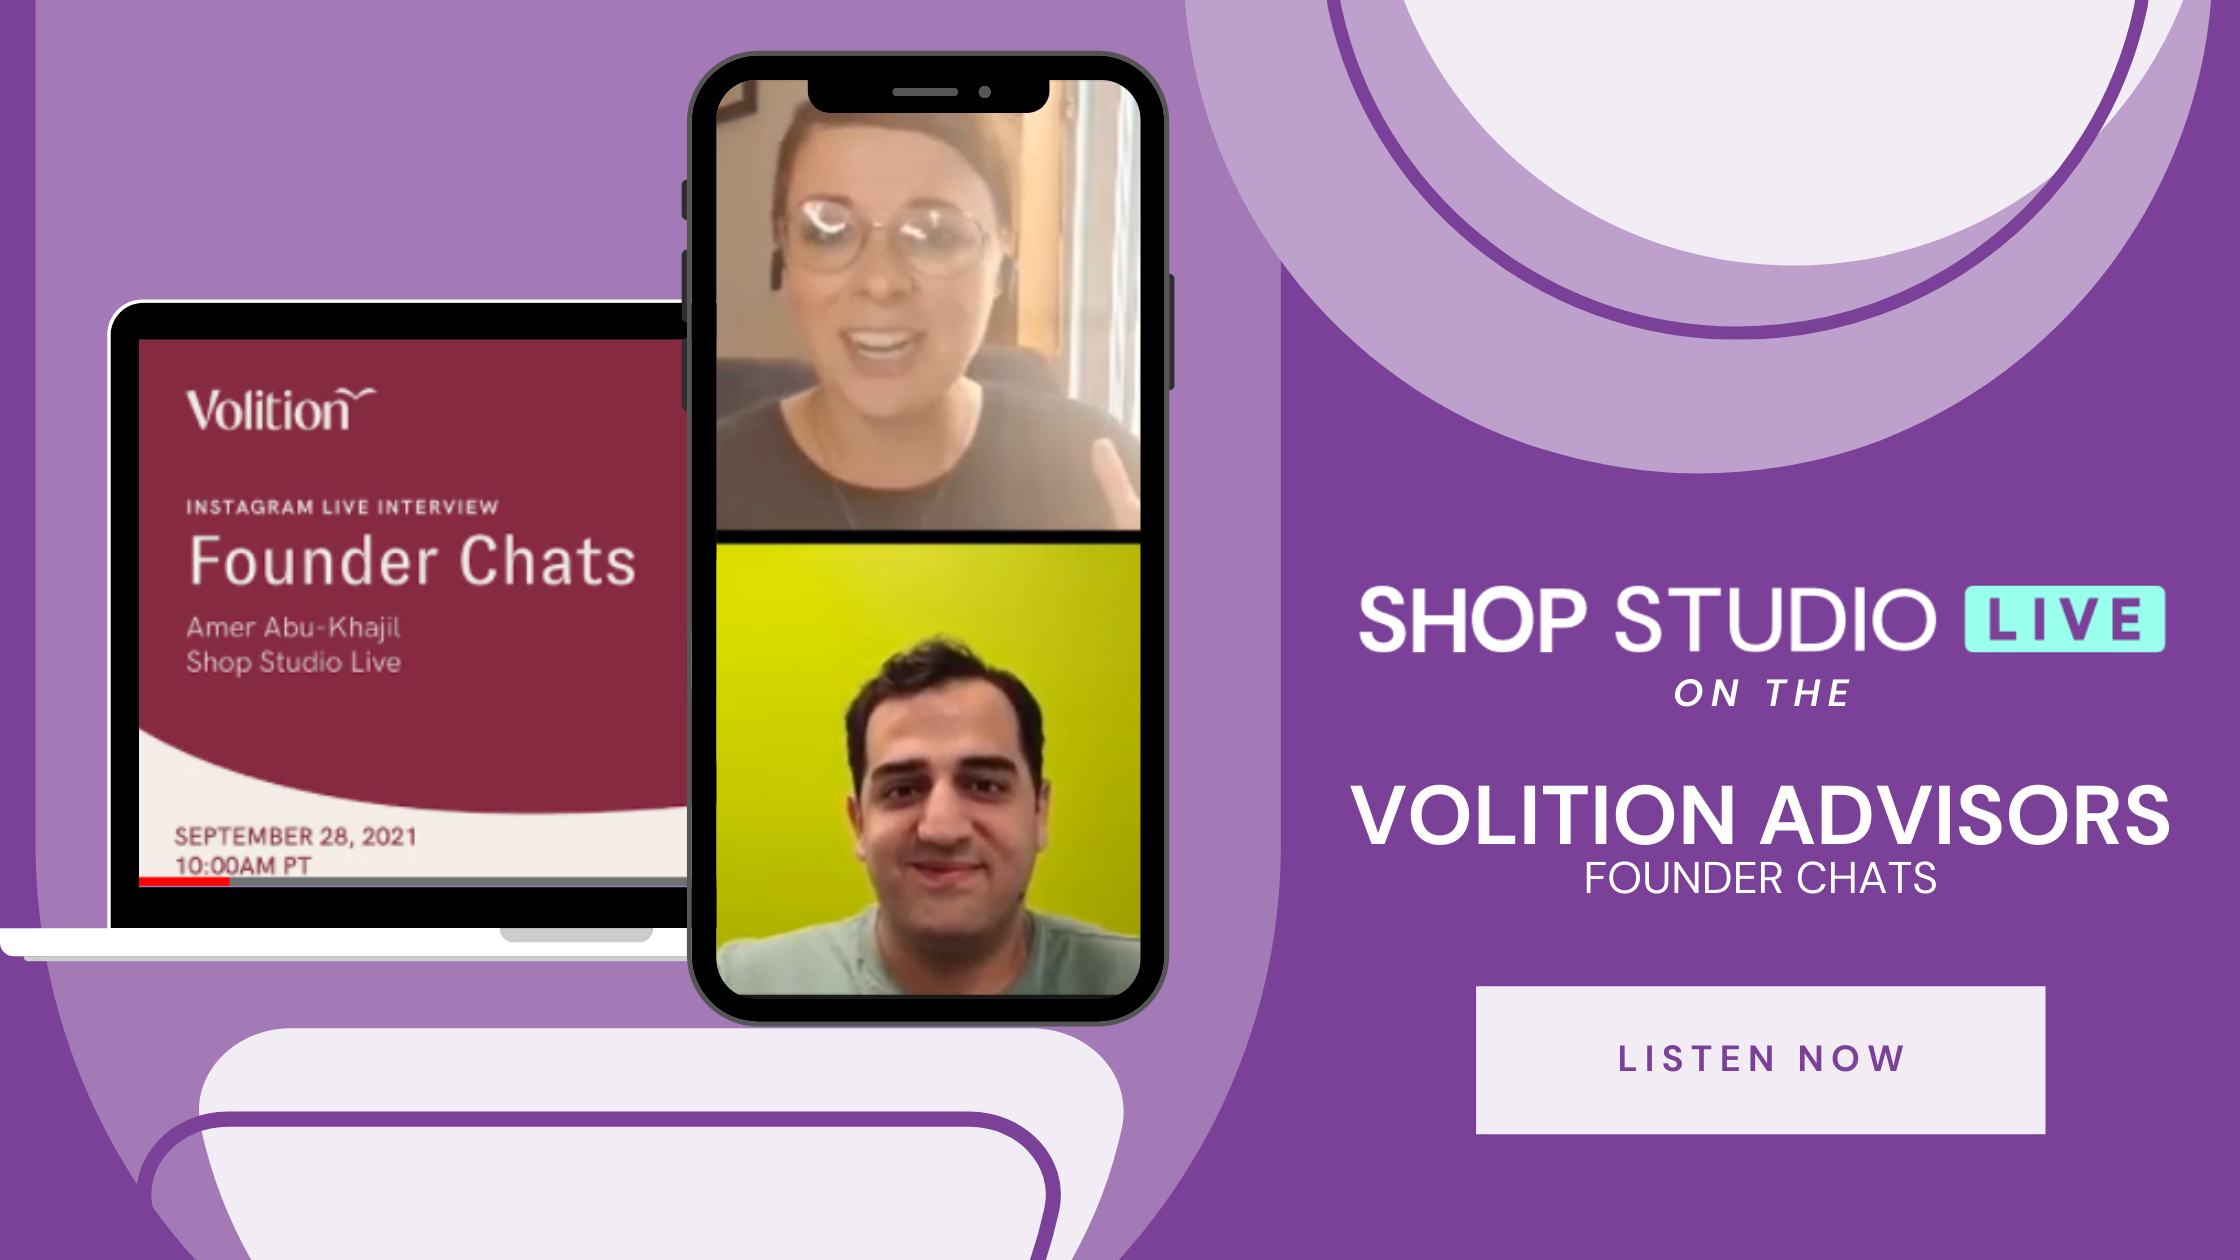 Video Podcast: Volition Advisors Founder Chats x Shop Studio Live